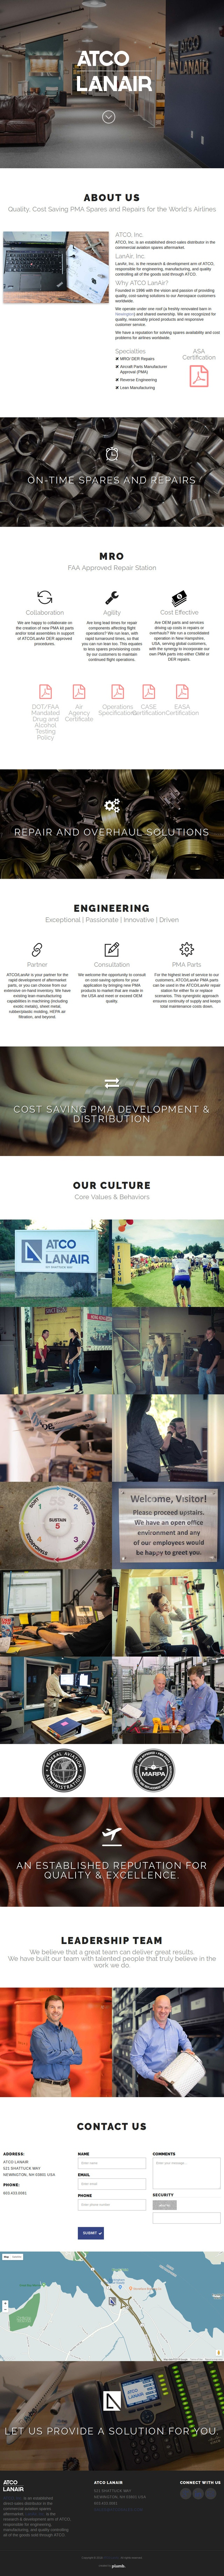 lanairinc.com